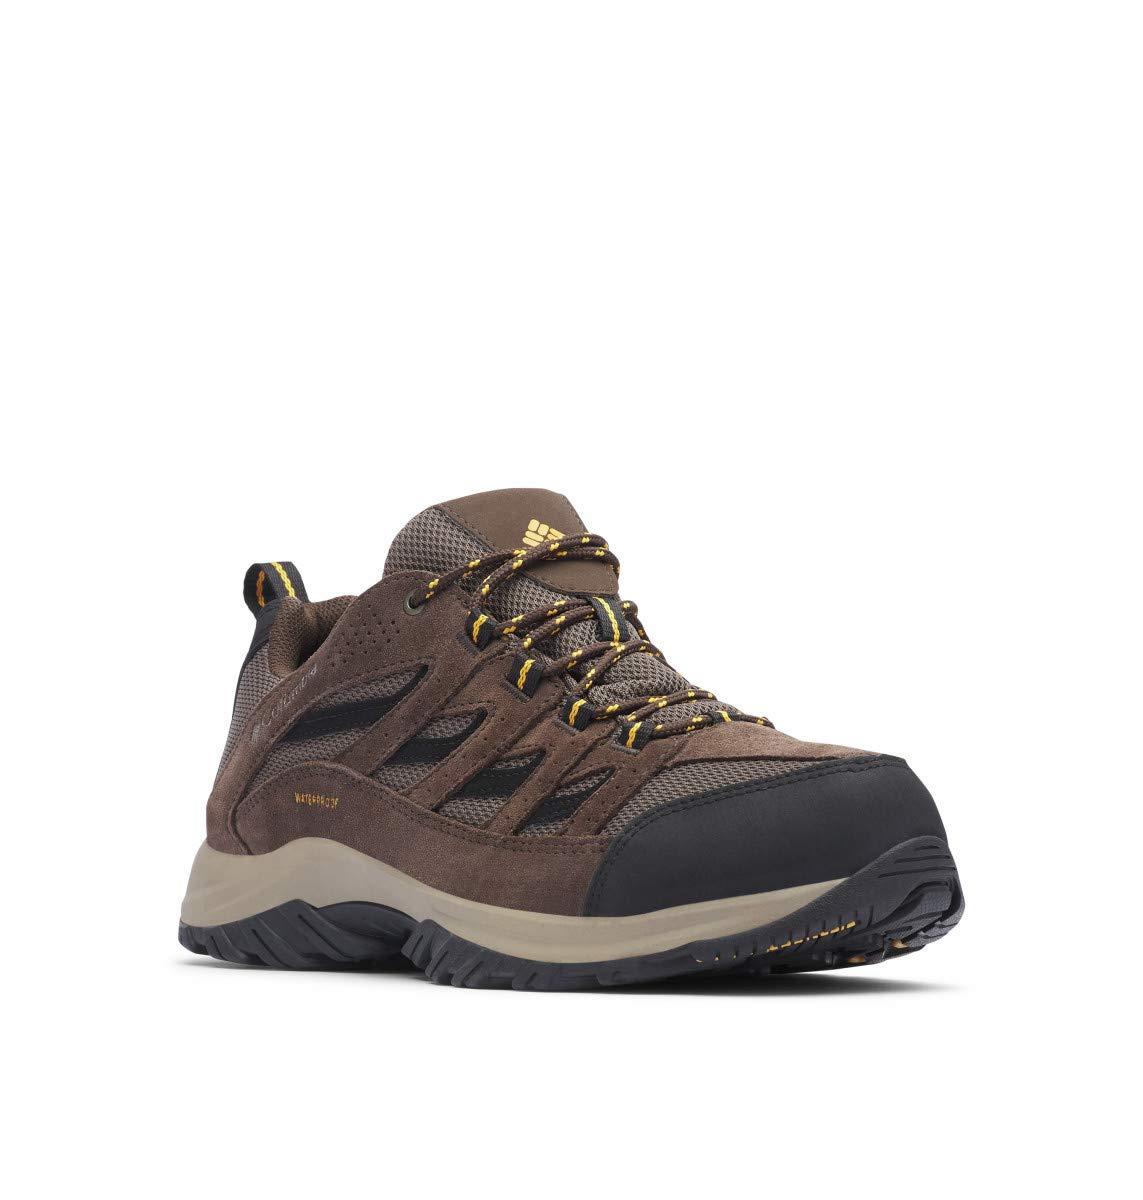 Columbia Men's Crestwood Waterproof Wide Hiking Shoe, mud, Squash, 15  Wide US